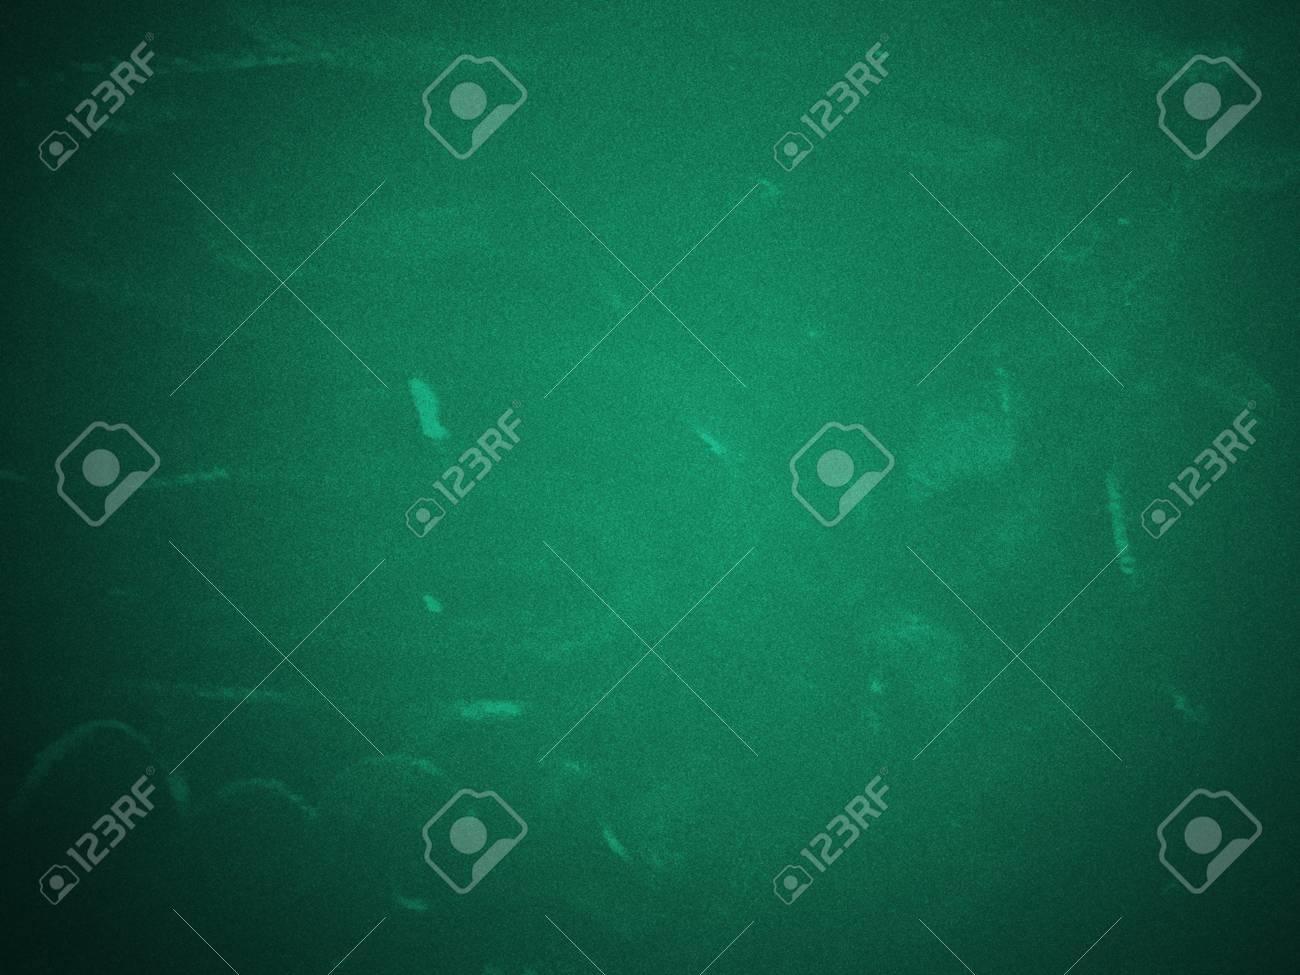 illustration illustration of grunge green chalkboard blackboard texture background